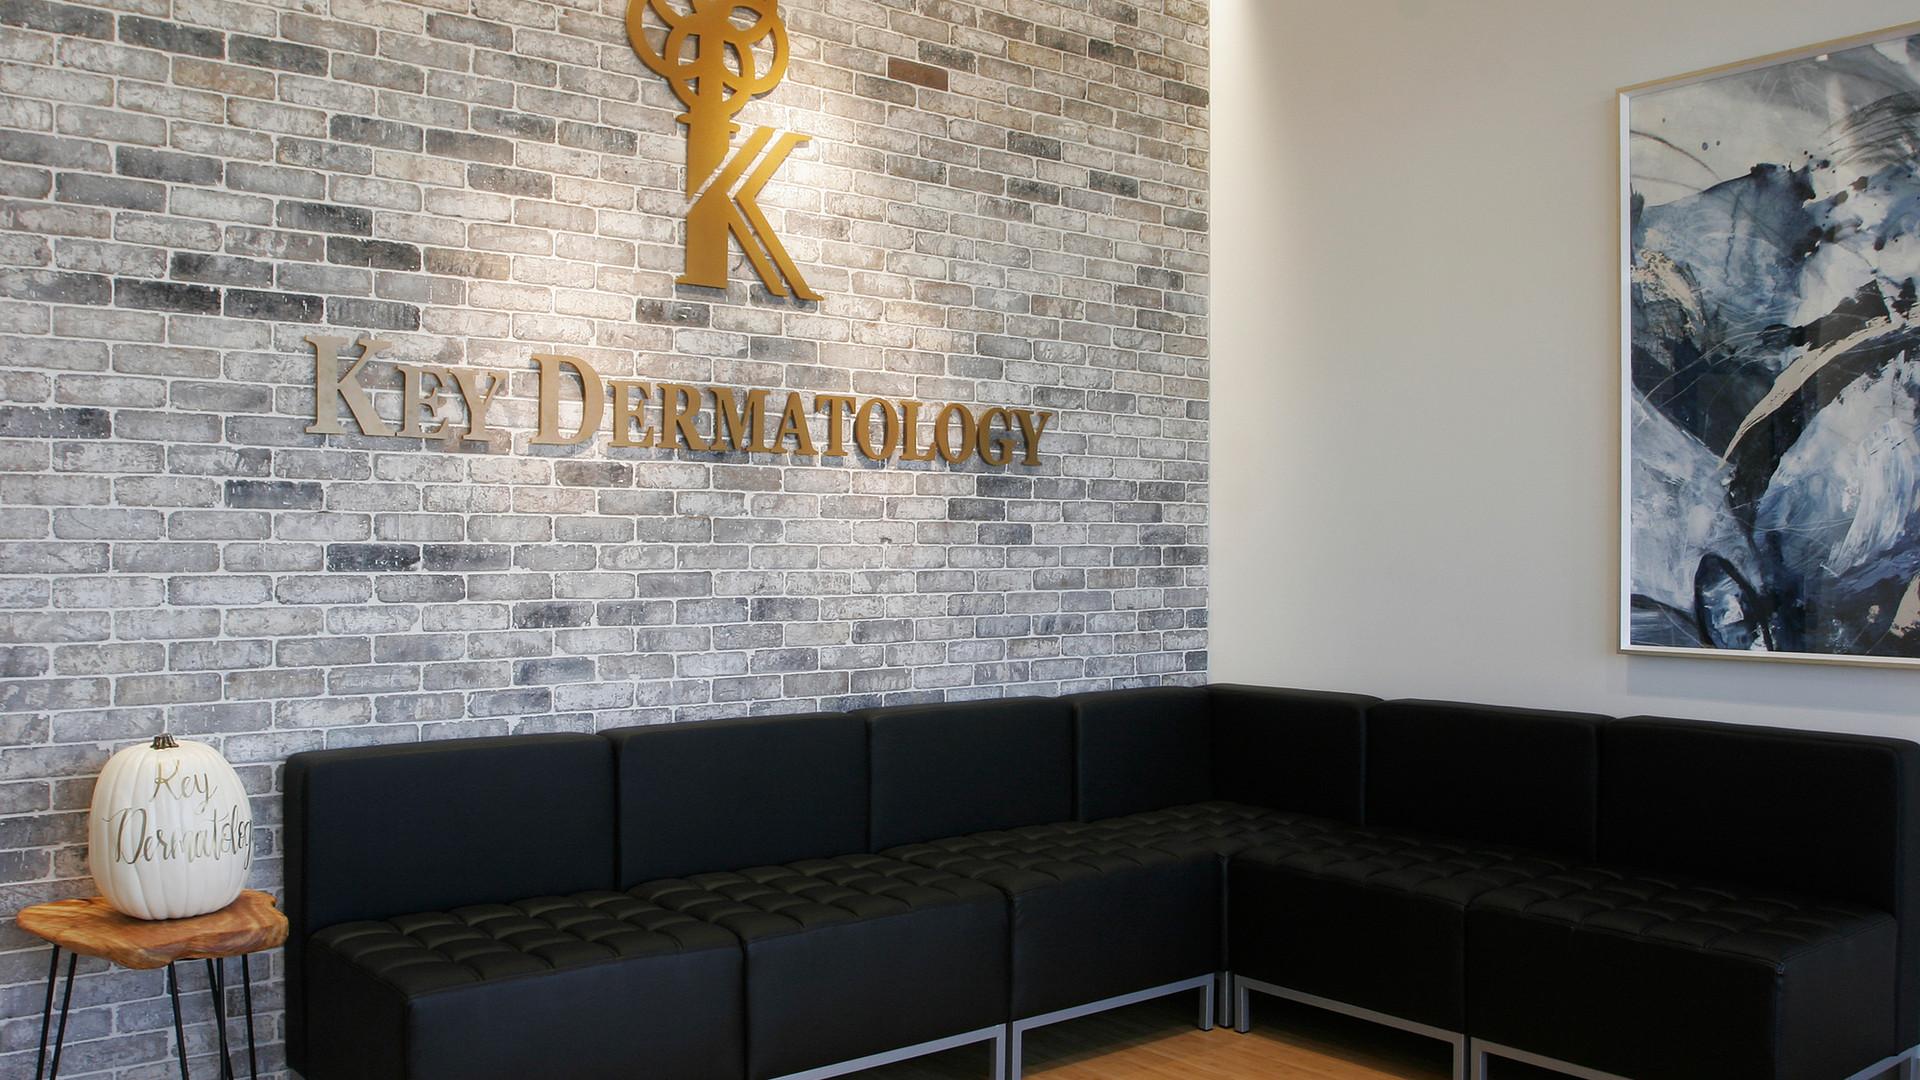 Key Dermatology